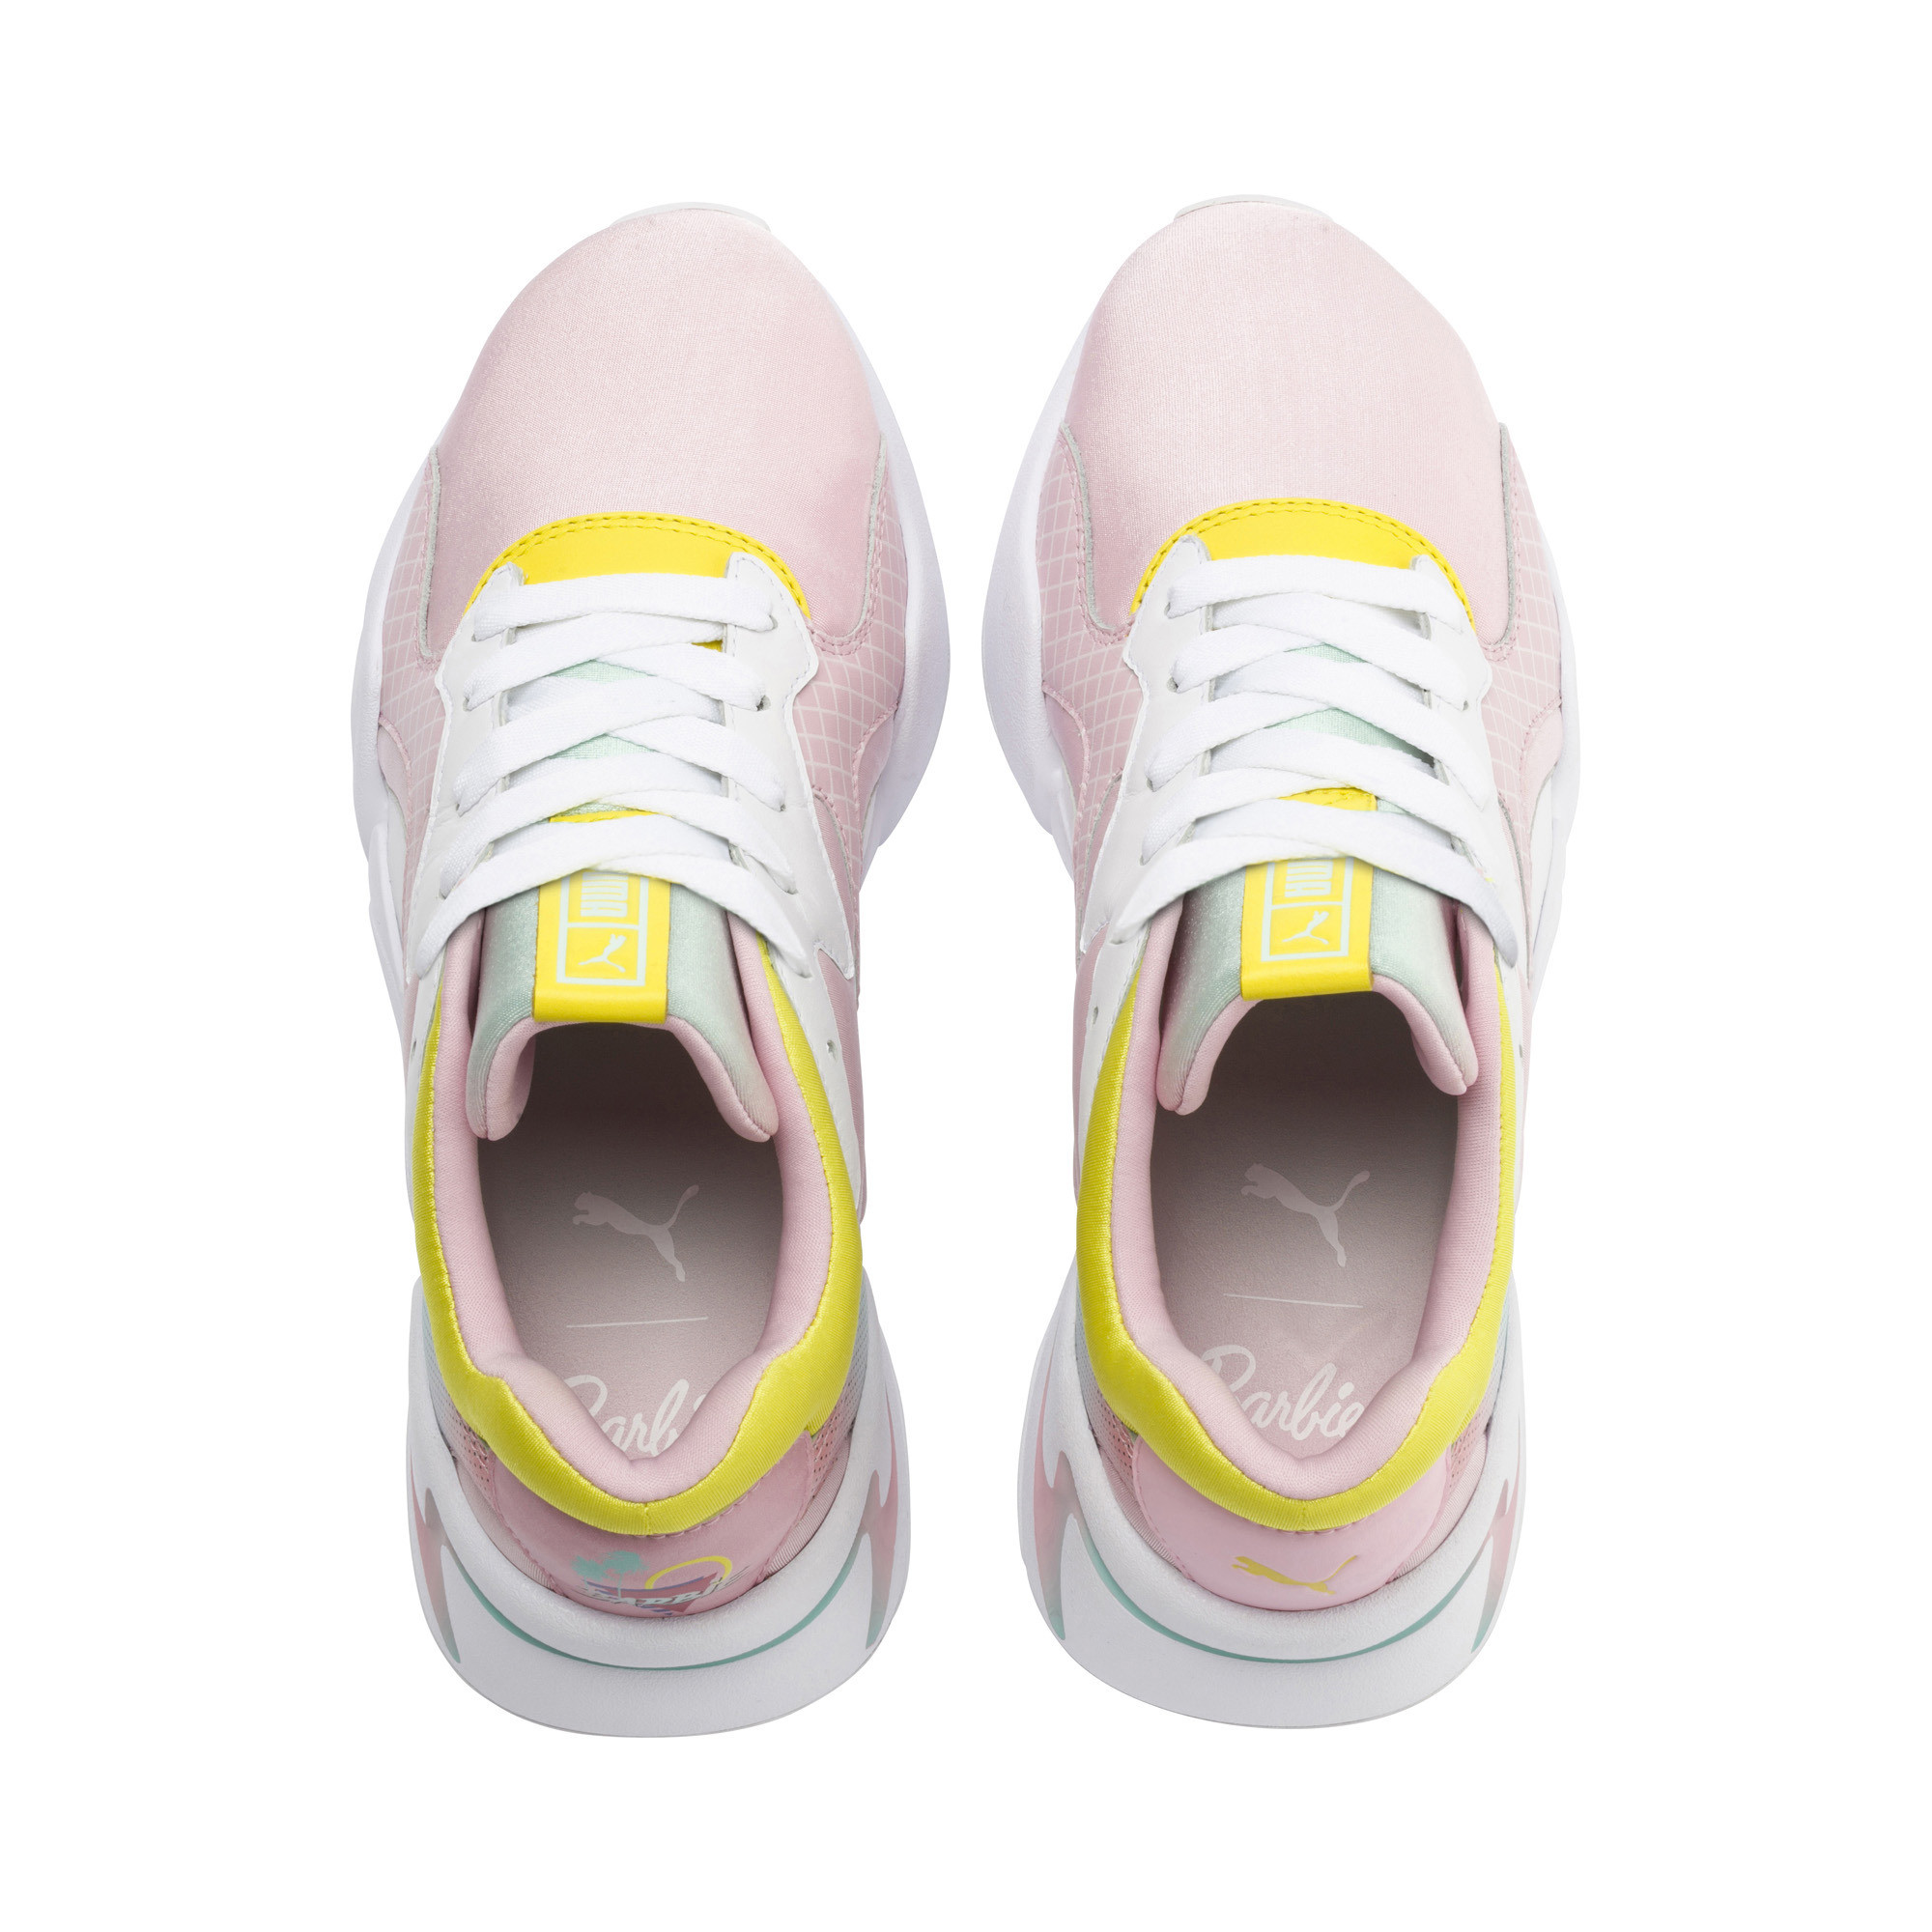 Image Puma PUMA x BARBIE Nova Sneakers #6